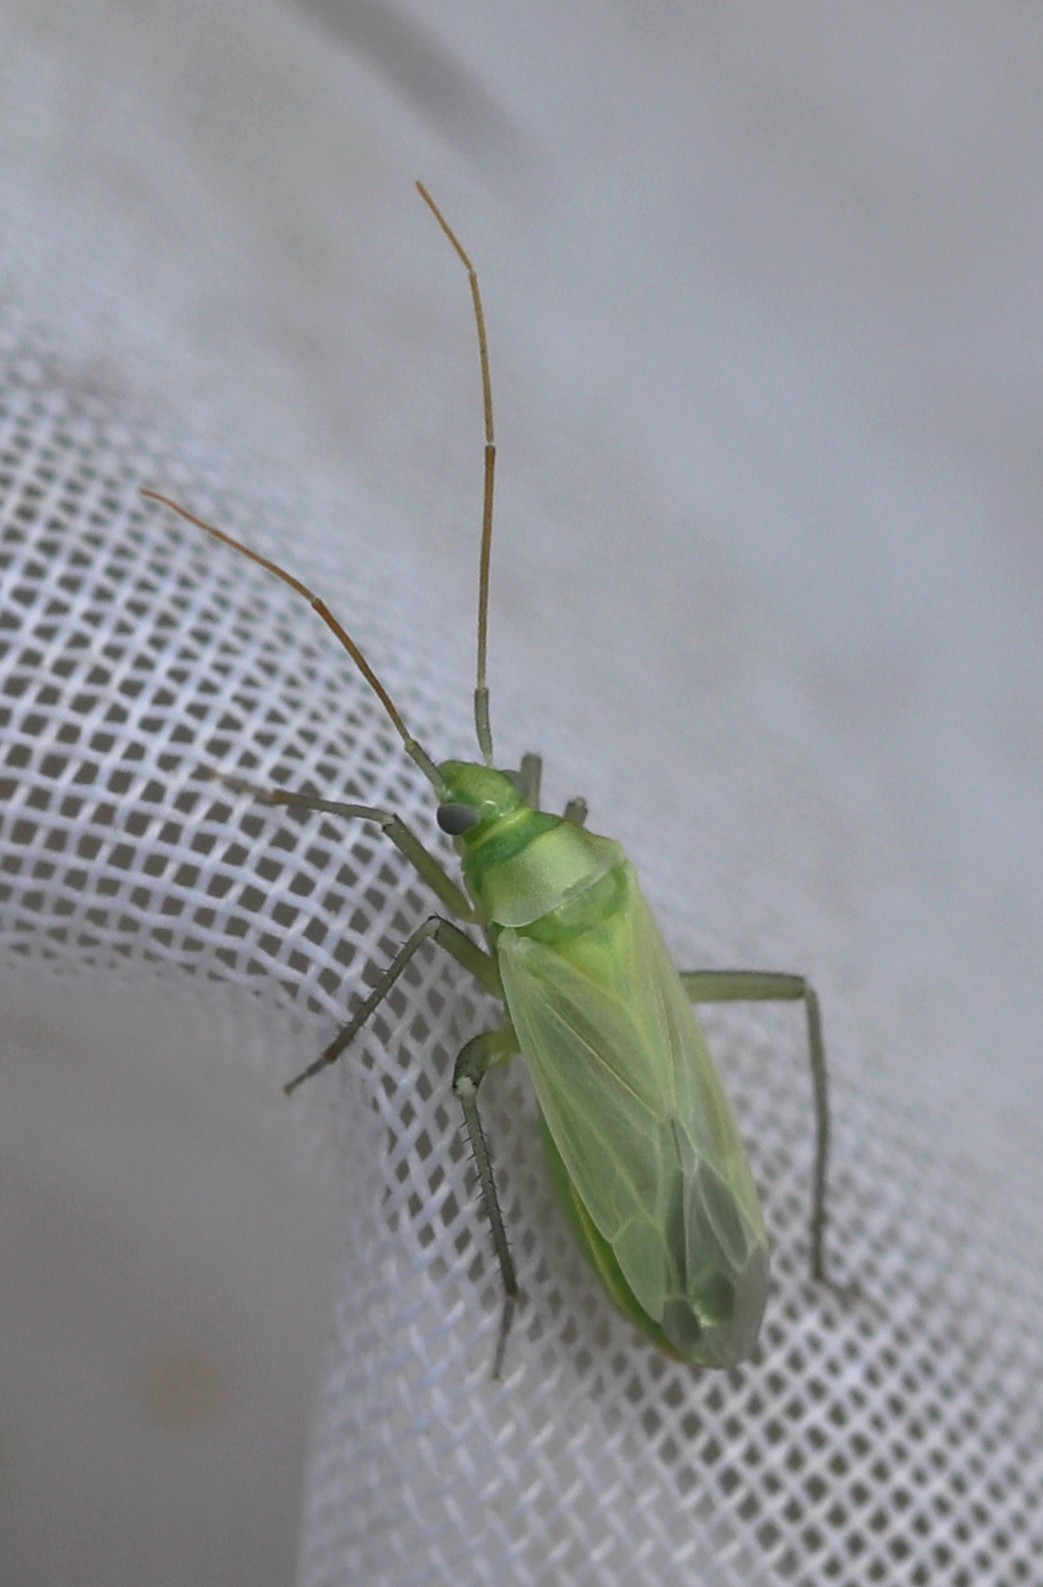 [Adelphocoris sp.] Une verte glabre Hymi_810